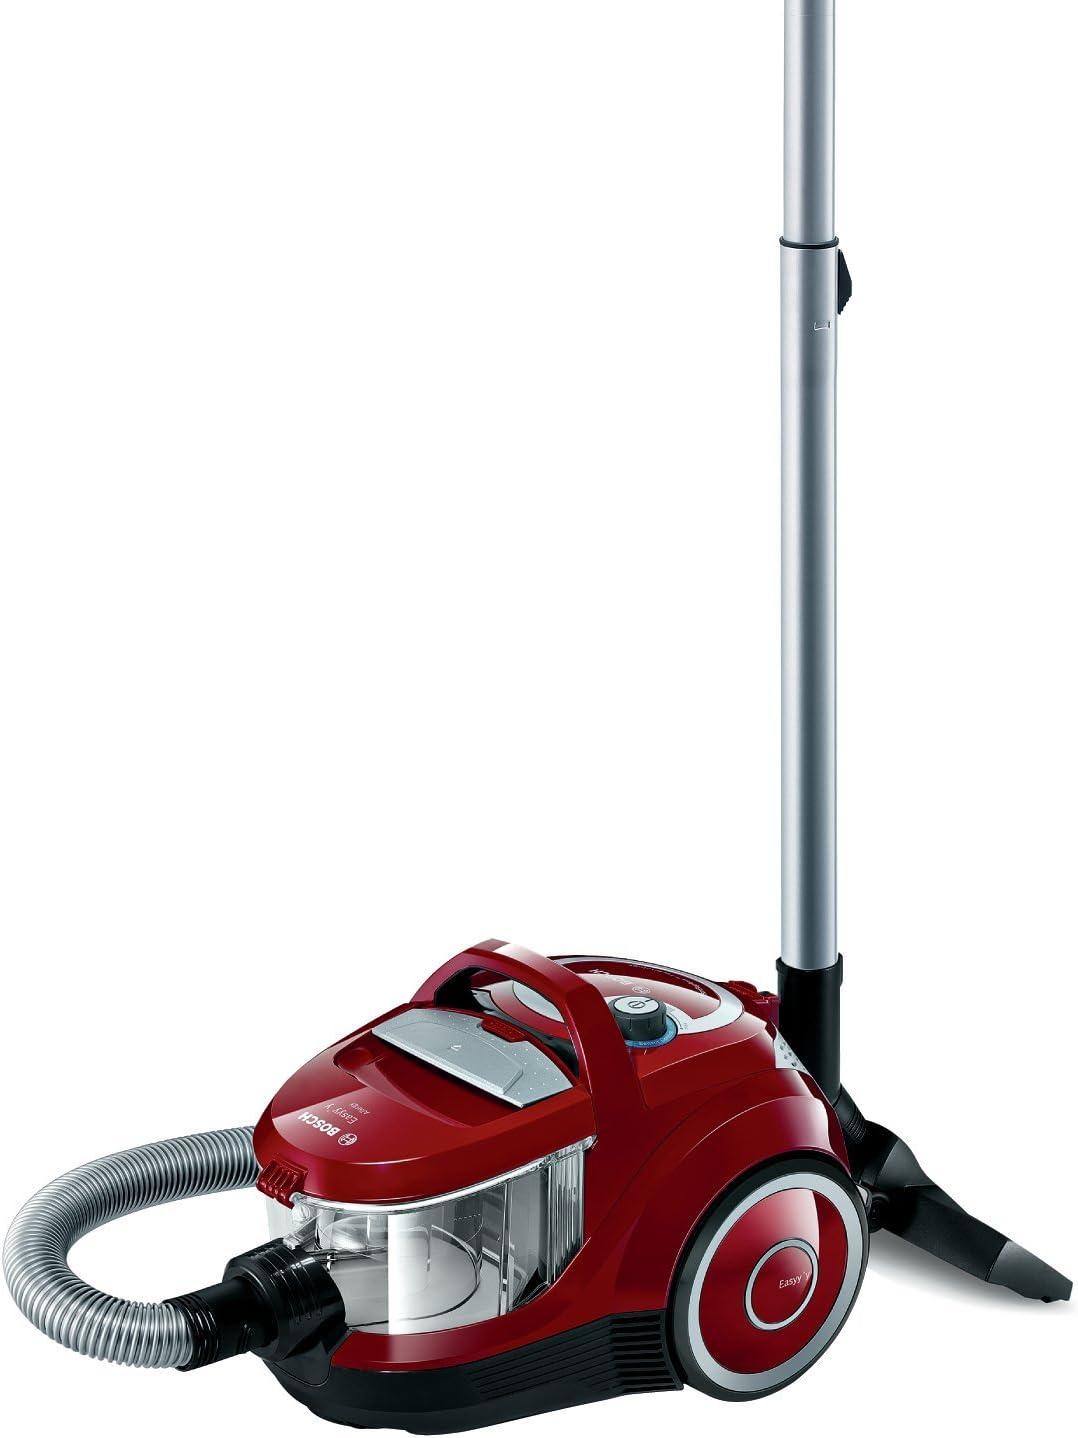 Bosch bgc2u230 Aspiradora sin bolsa 2300 W 1,4 L color rojo: Amazon.es: Hogar